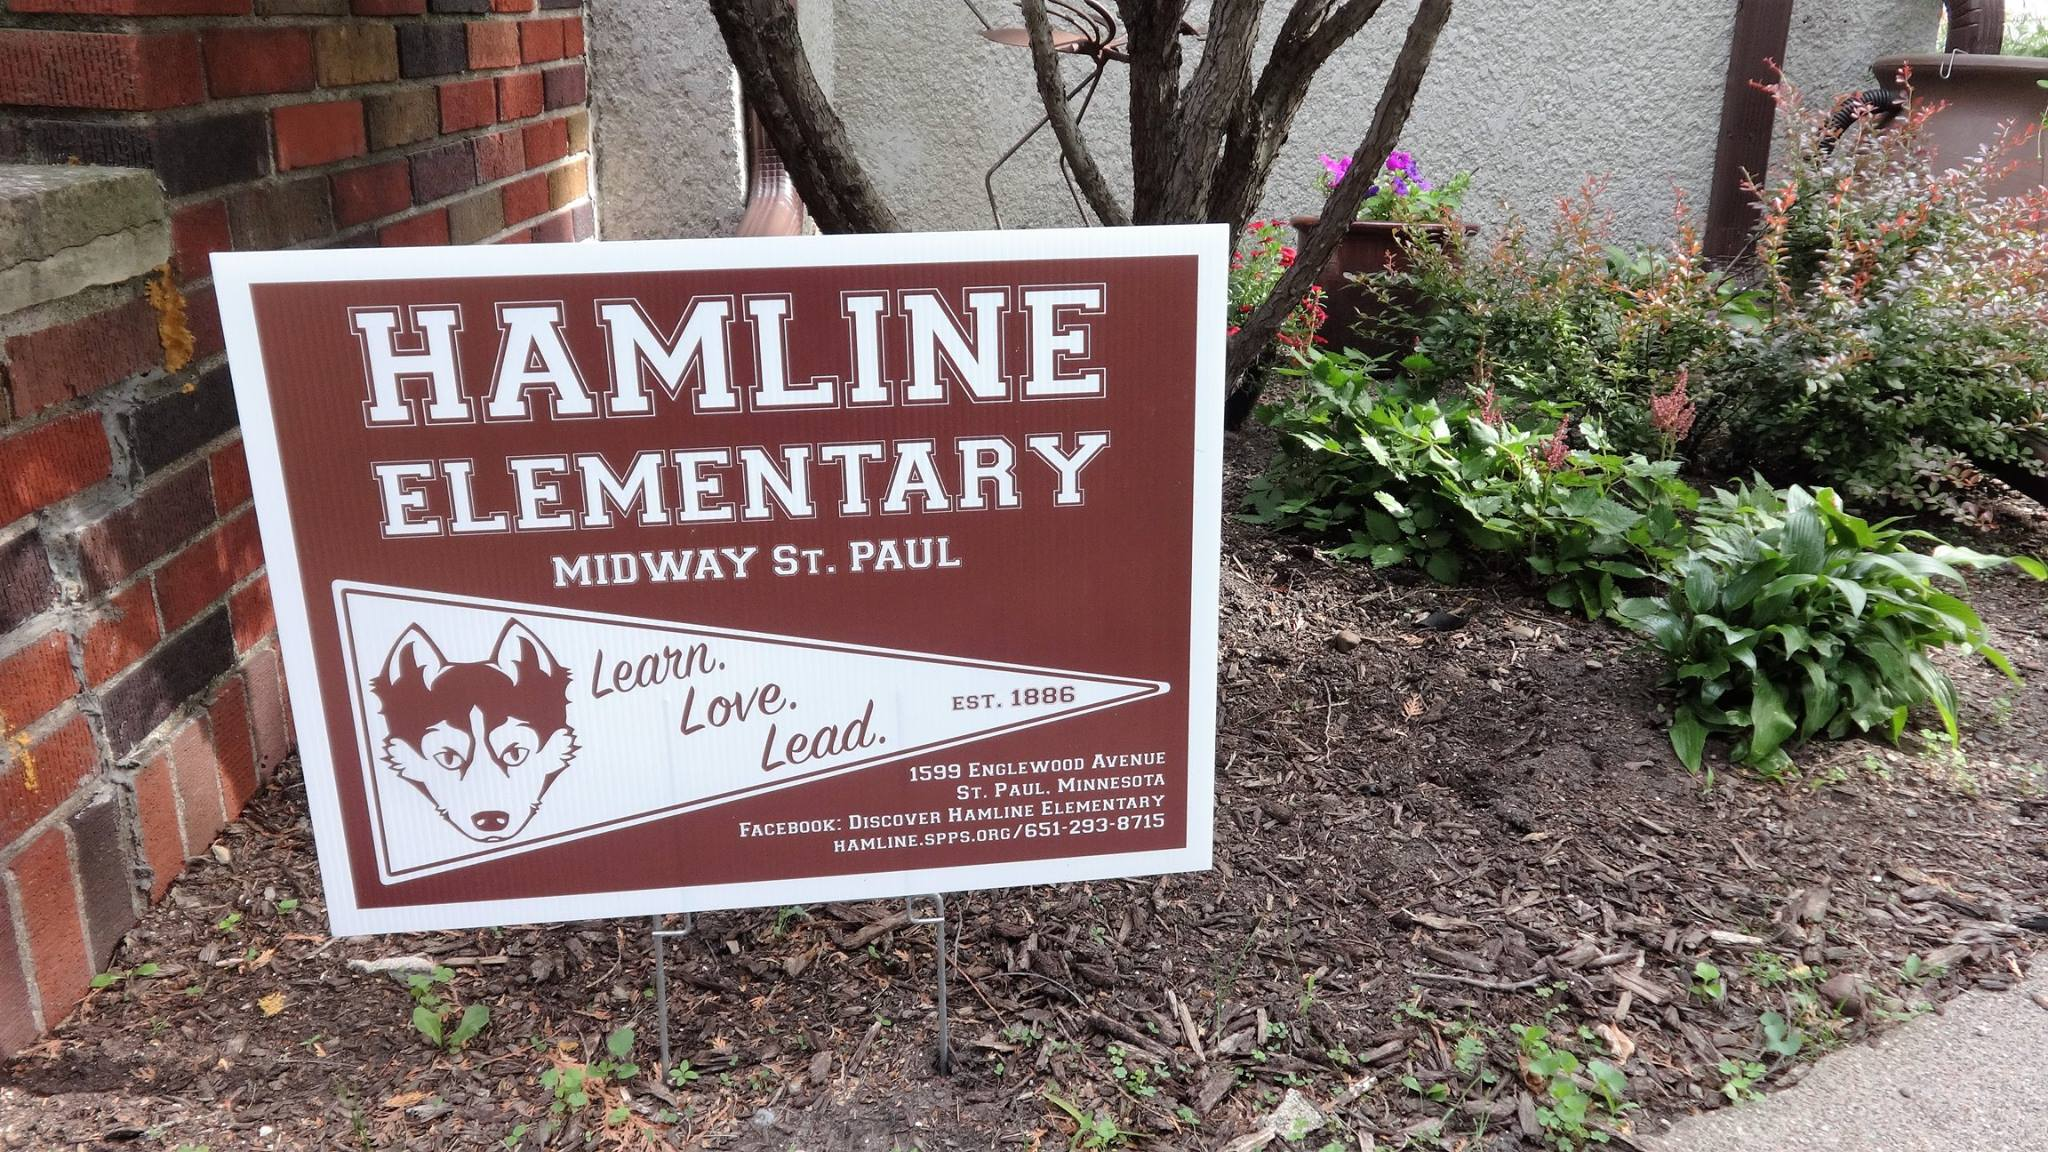 Hamline Elementary School / Homepage